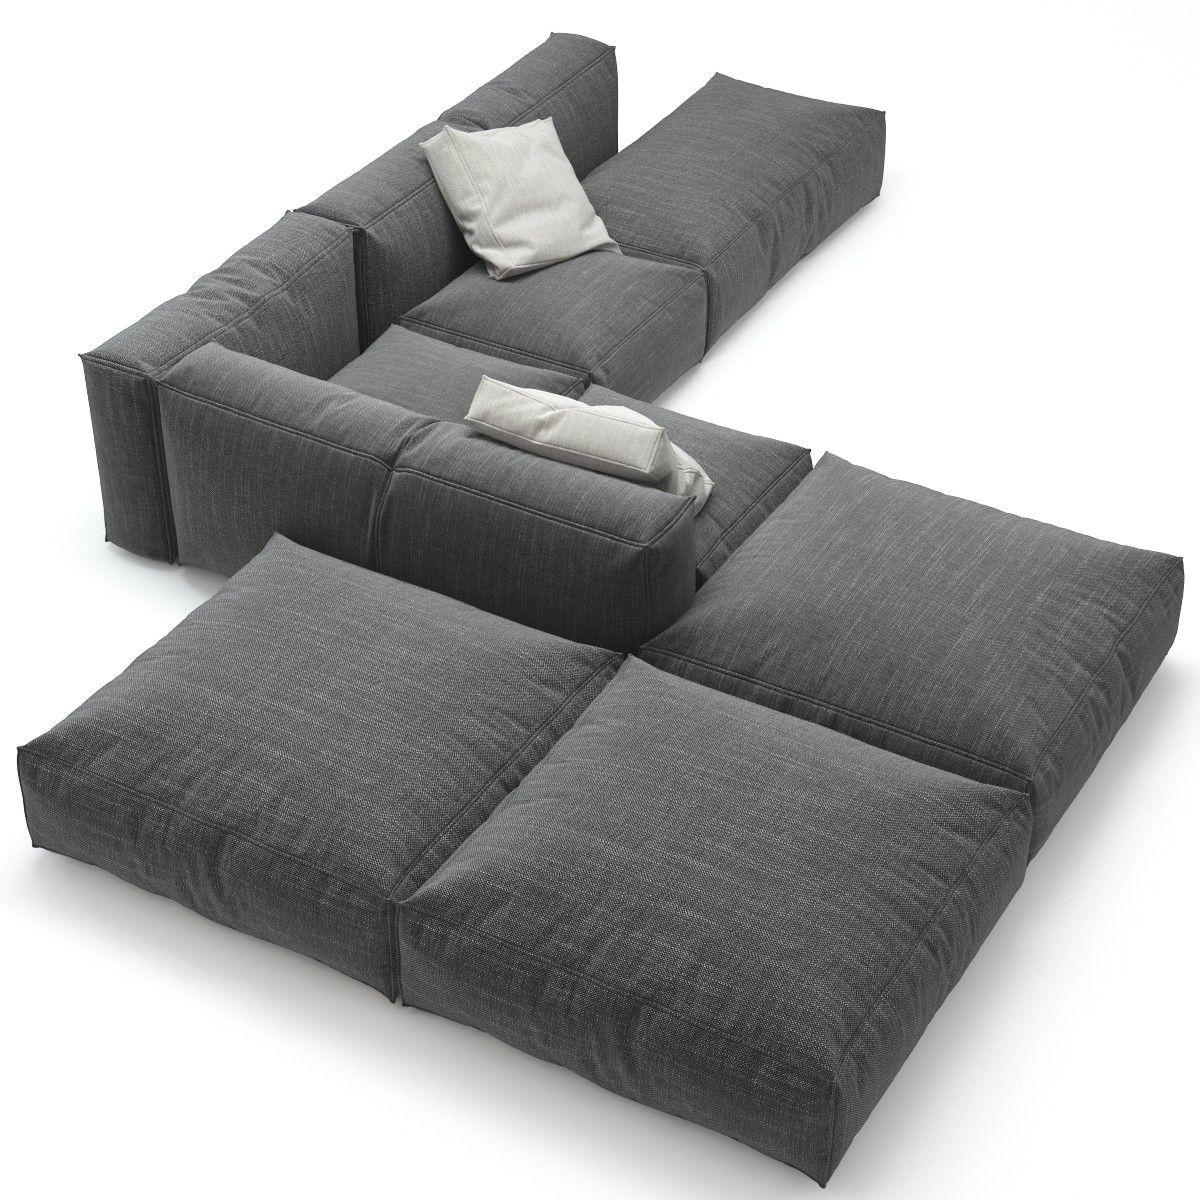 3d Peanut B Bonaldo Sofa Small Living Room Design Sofa Bed For Small Spaces Convertible Sofa